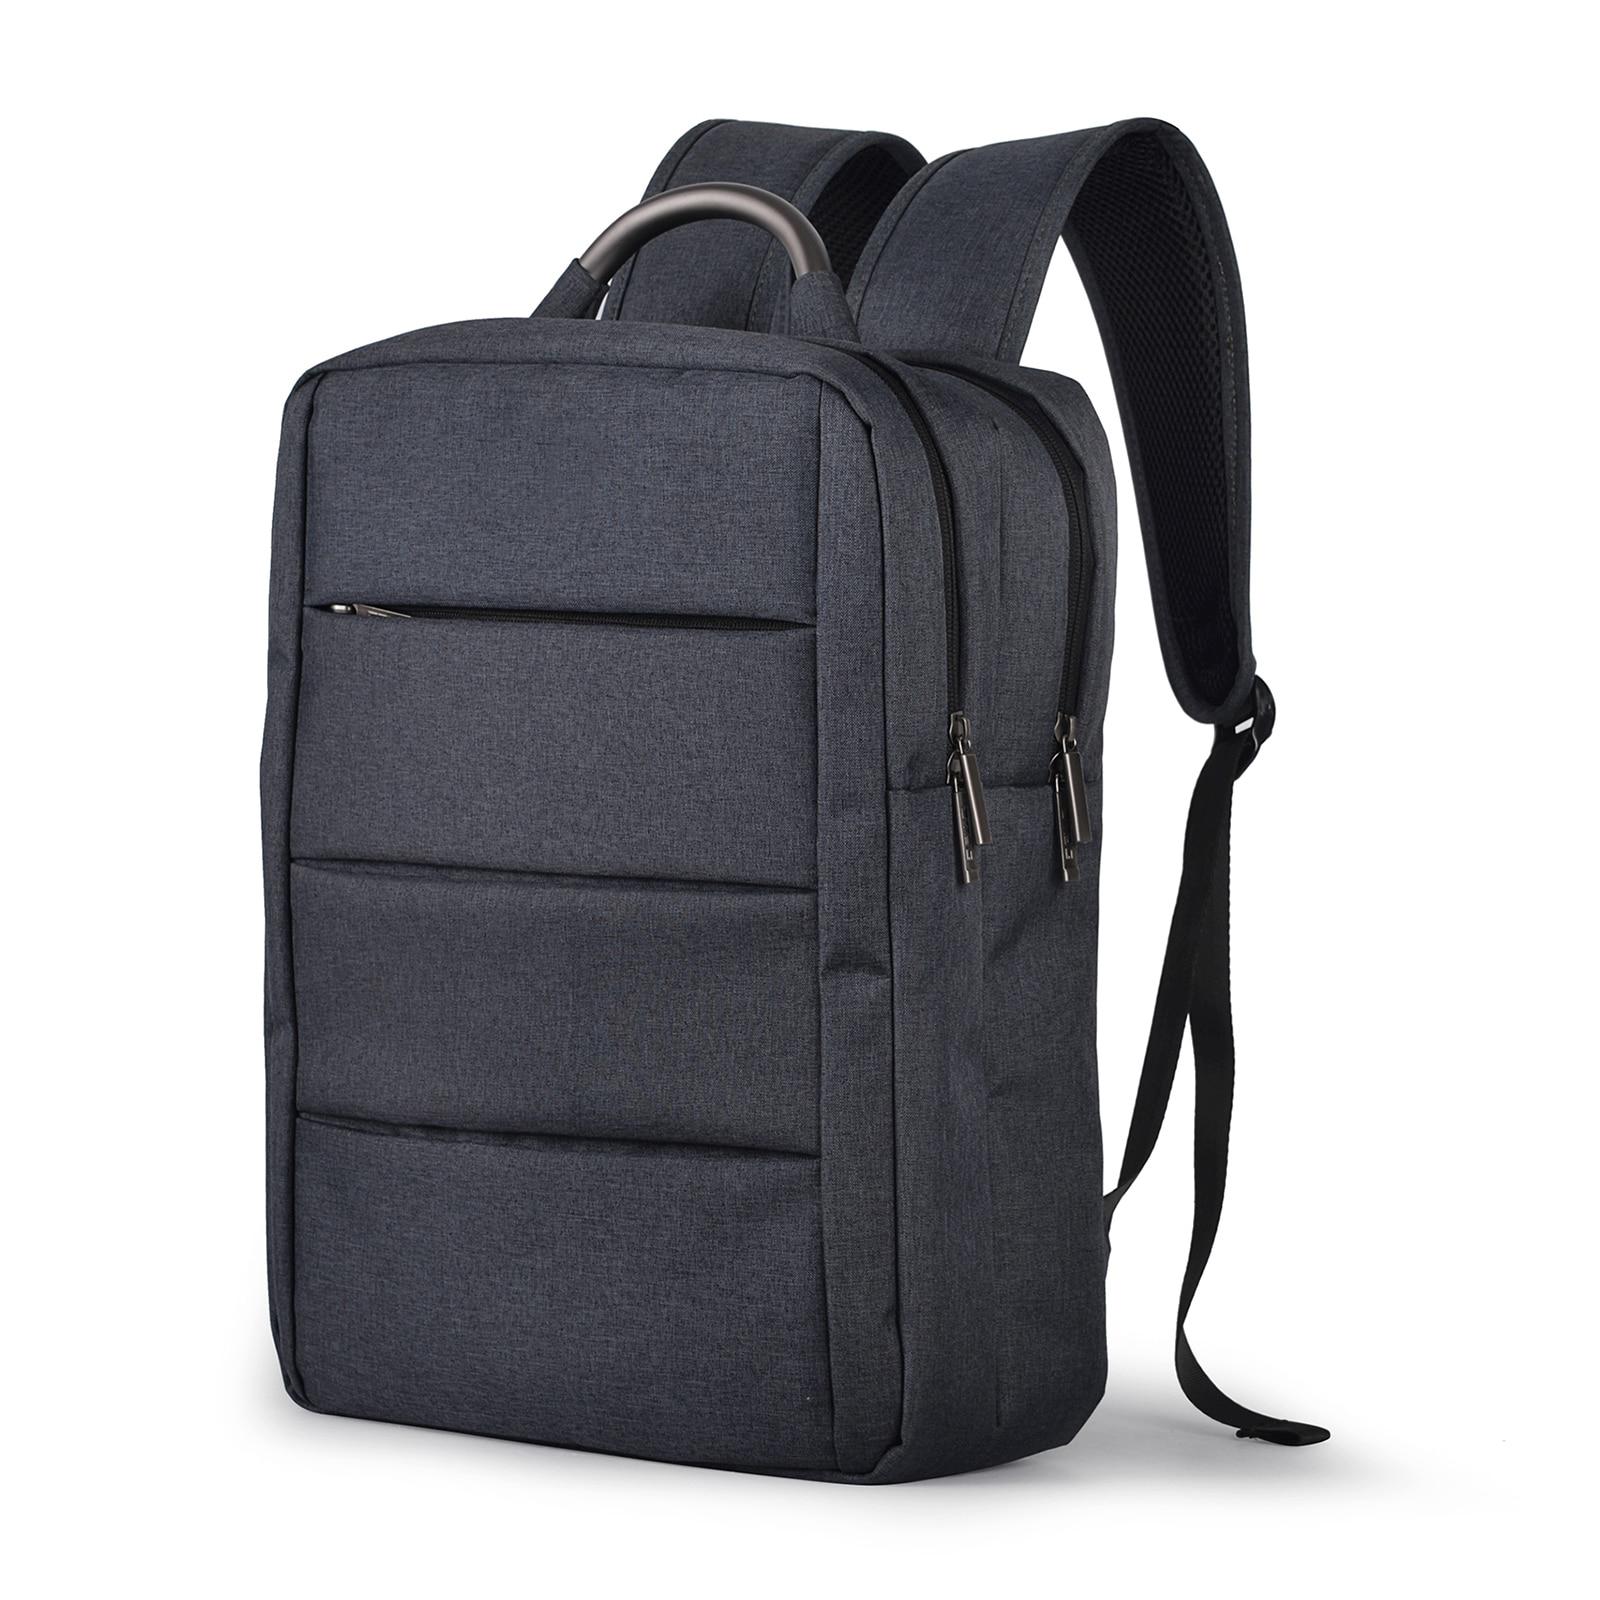 Classic Business Backpacks Men Waterproof Students Laptop Bag Men Women Trackvel Backpack For 15 Inch Laptop voyjoy t 530 travel bag backpack men high capacity 15 inch laptop notebook mochila waterproof for school teenagers students